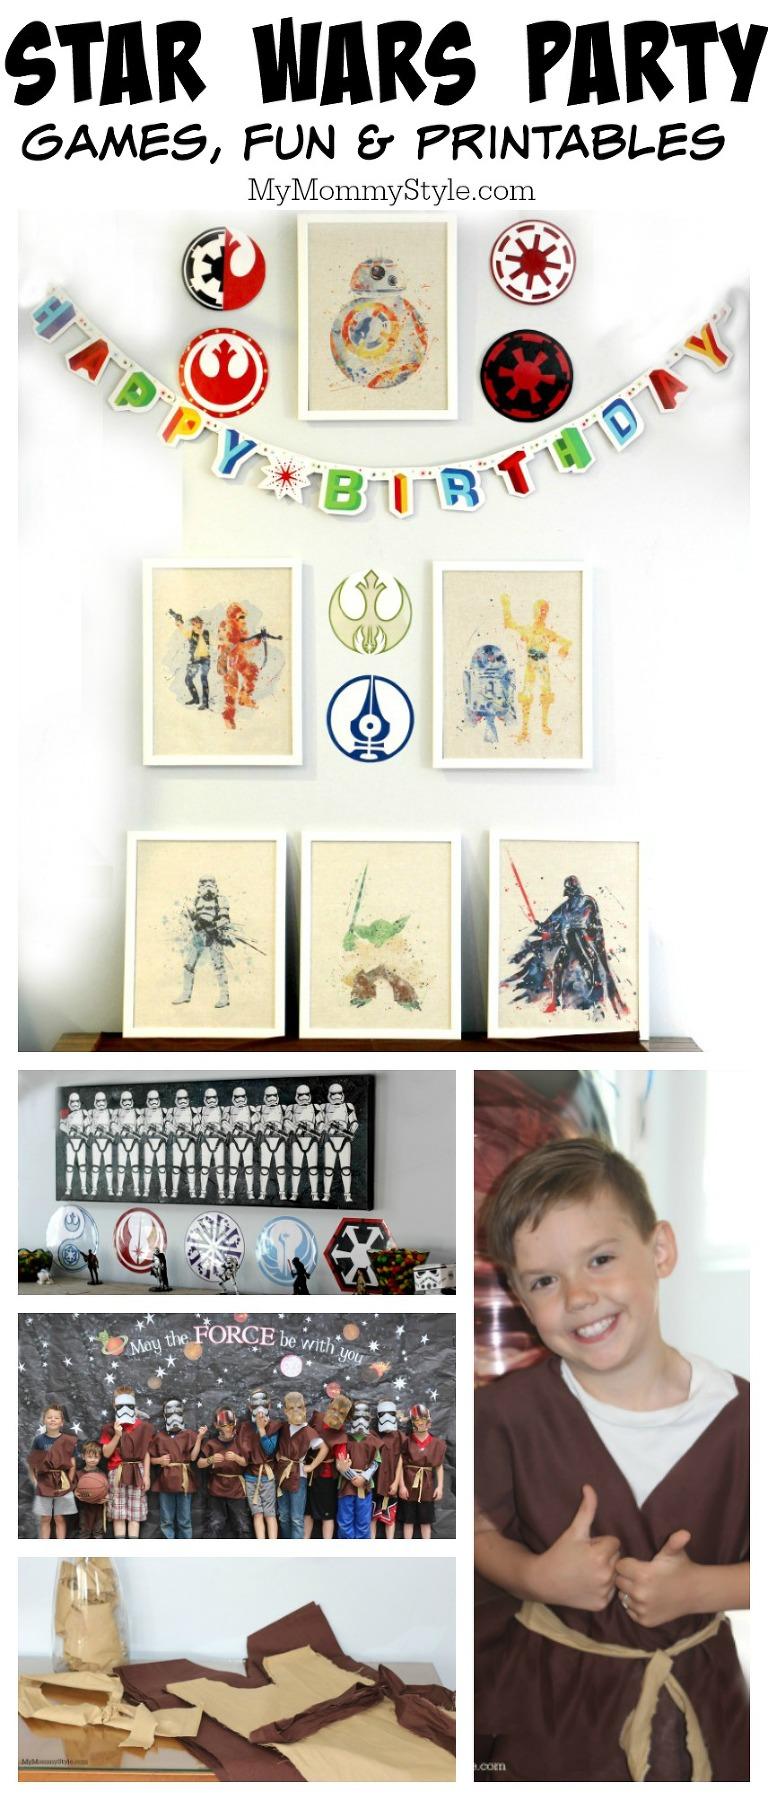 Star Wars Party, Star Wars Birthday Party, Star Wars, Star Wars games